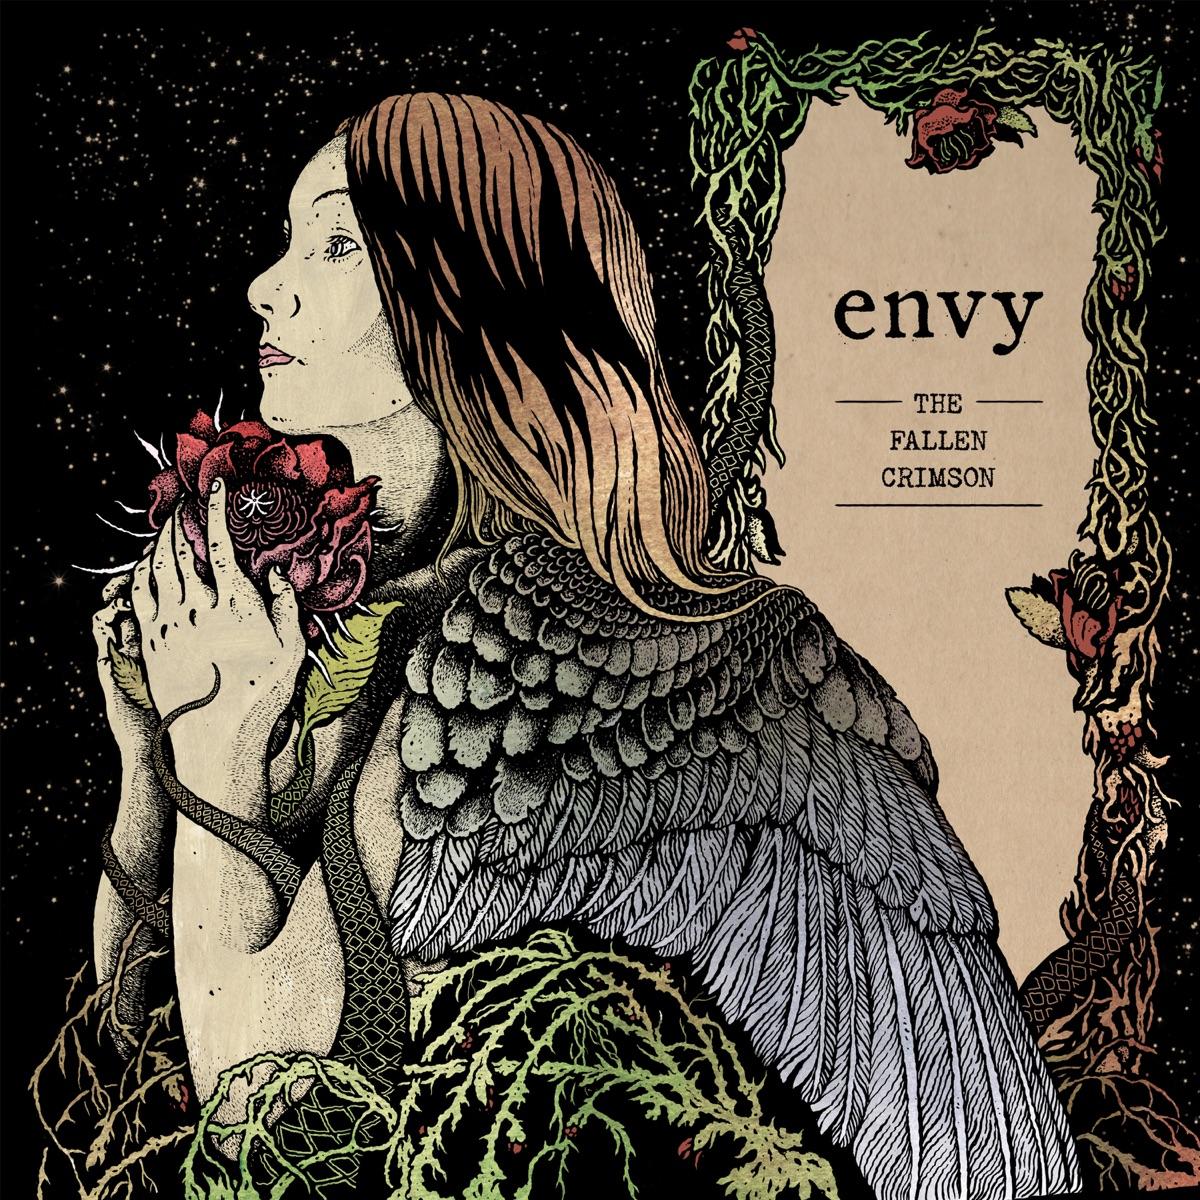 『envy - A Step in the Morning Glow』収録の『The Fallen Crimson』ジャケット